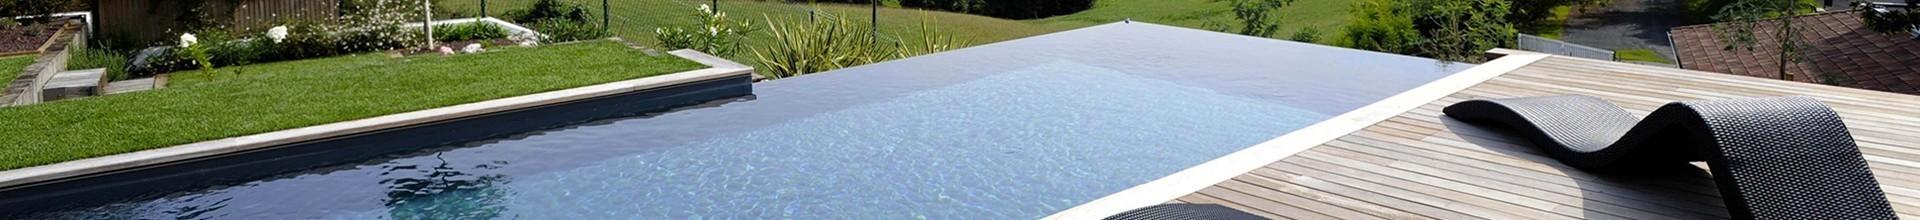 Direct usine, piscine coque prix Alpes-Haute-Provence